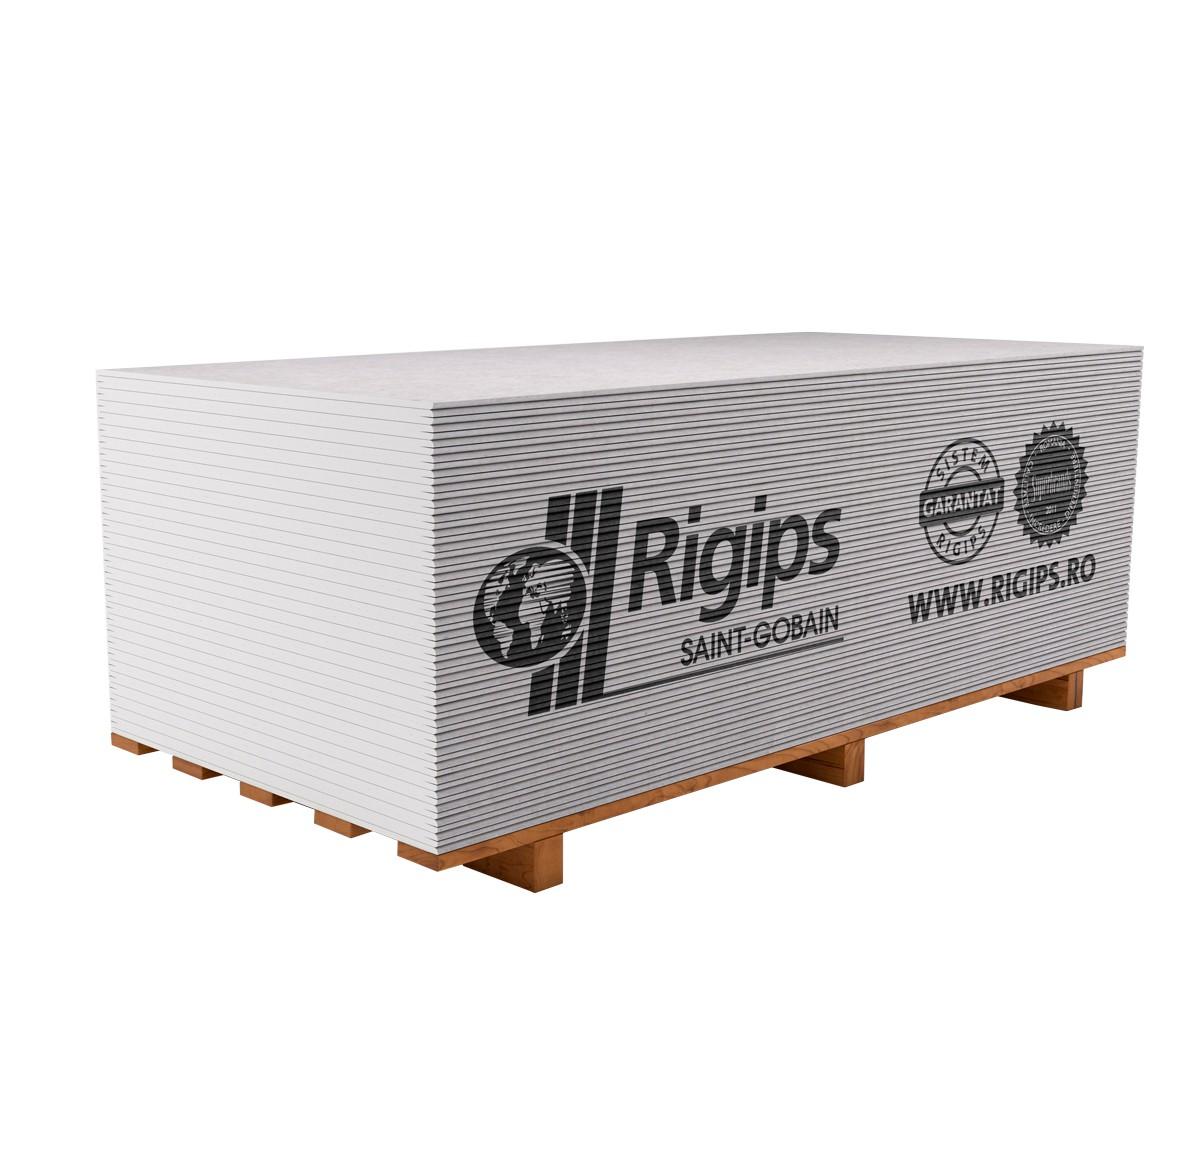 dedeman placa gips carton normala rigips rb 12 5 x 1200 x 2600 mm dedicat planurilor tale. Black Bedroom Furniture Sets. Home Design Ideas